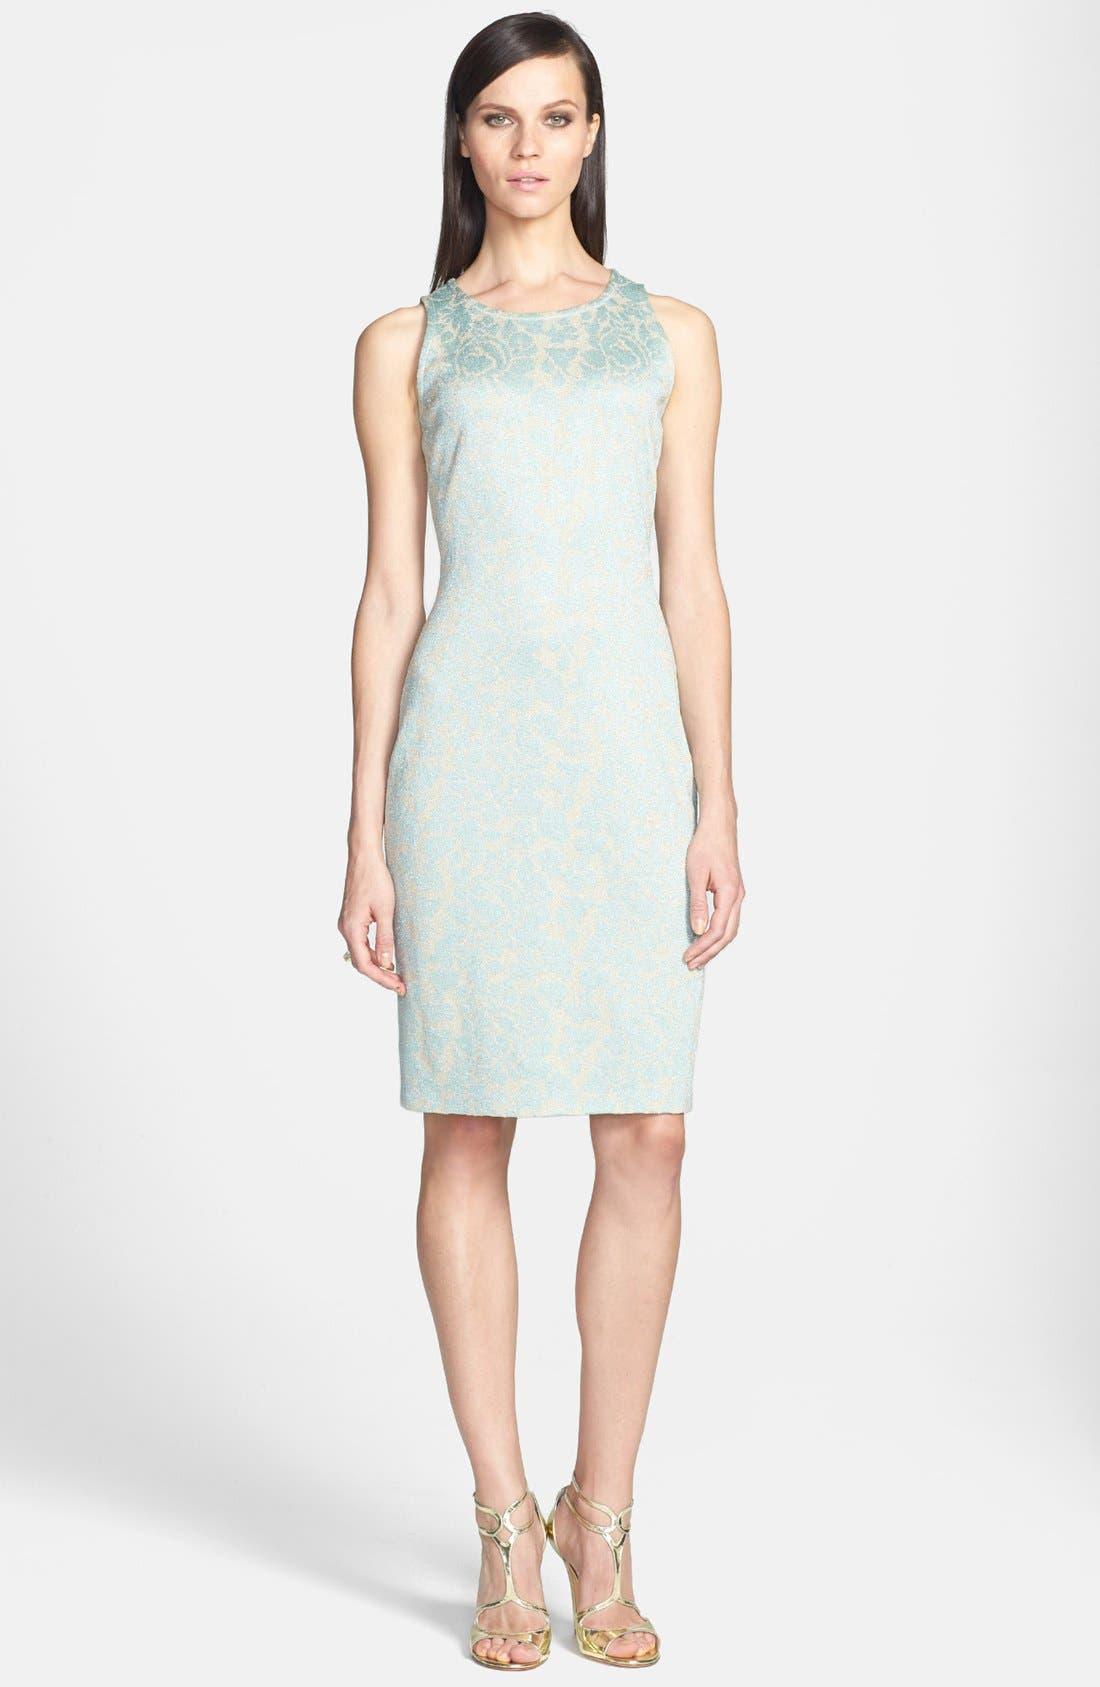 Alternate Image 1 Selected - St. John Collection Metallic Floral Jacquard Knit Sheath Dress